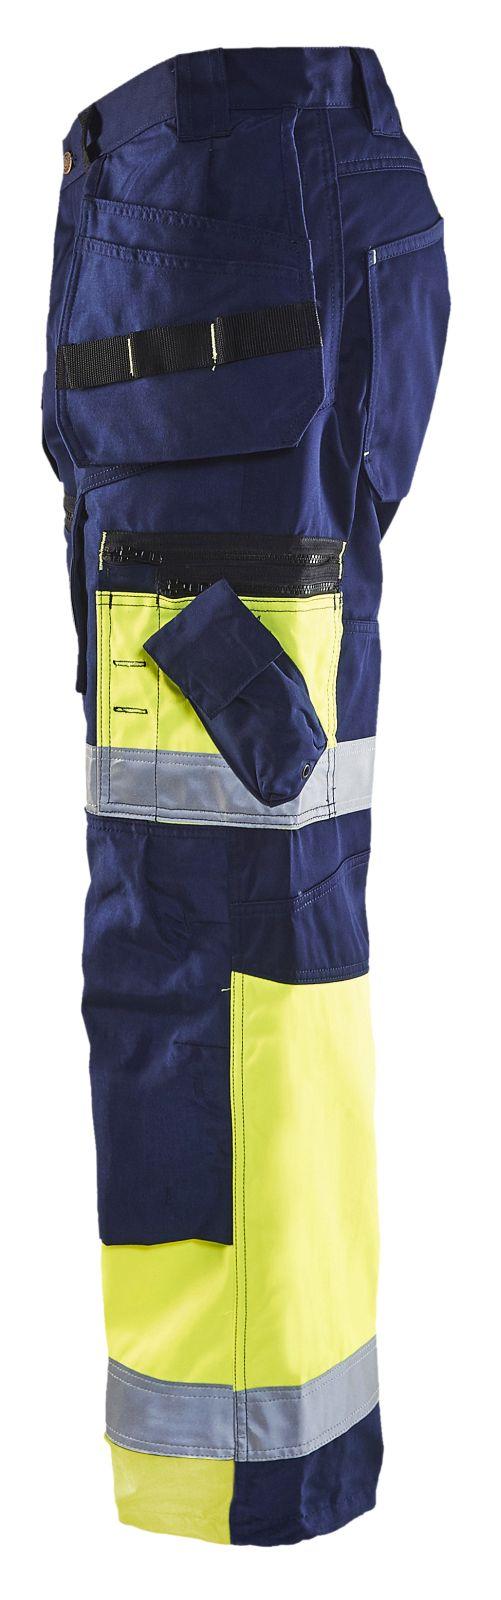 Blaklader Broeken 15081860 High Vis marineblauw-geel(8933)